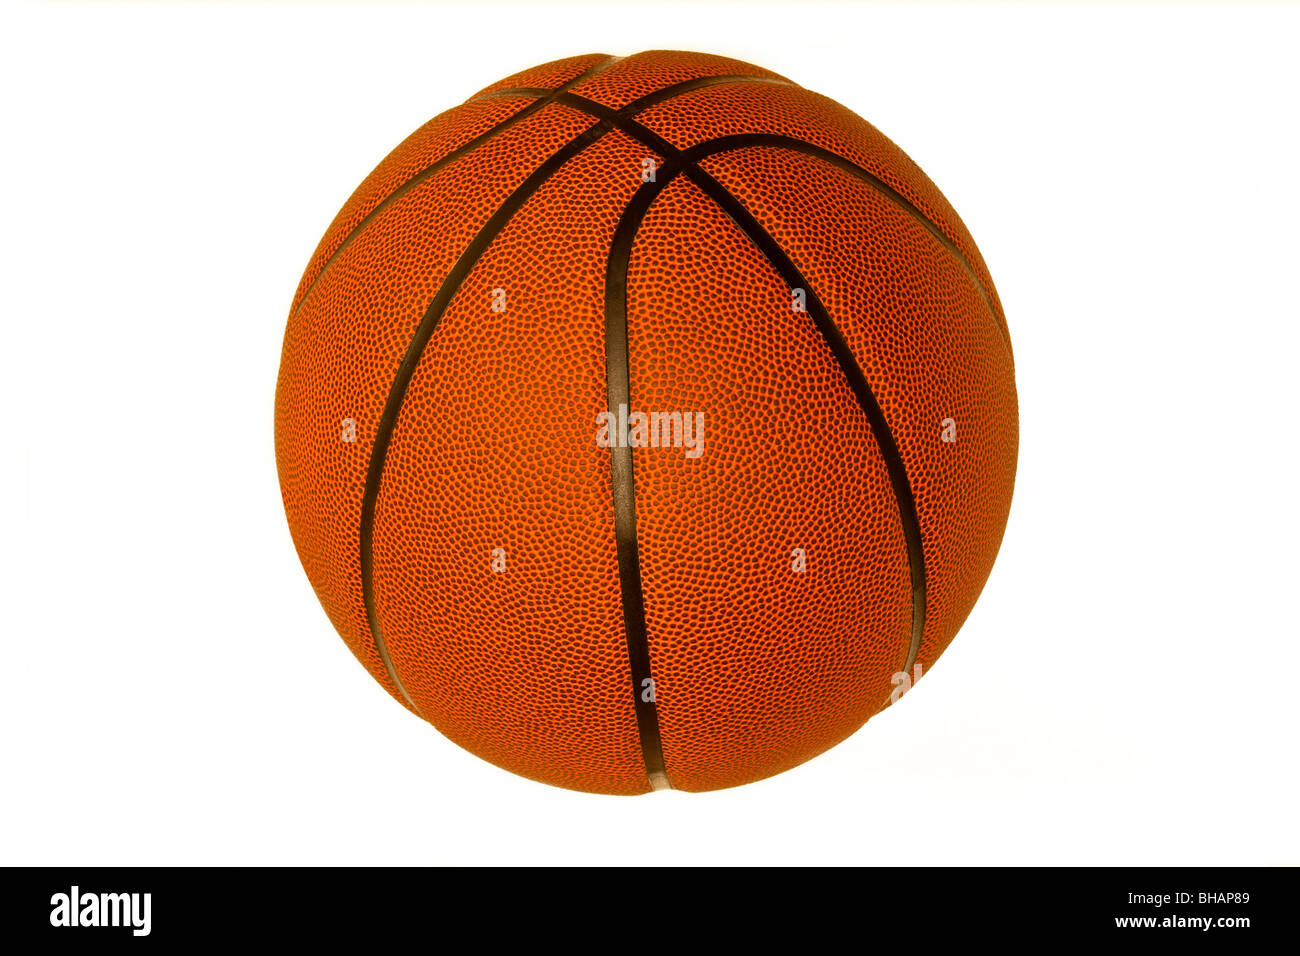 Basket-ball cut out Photo Stock